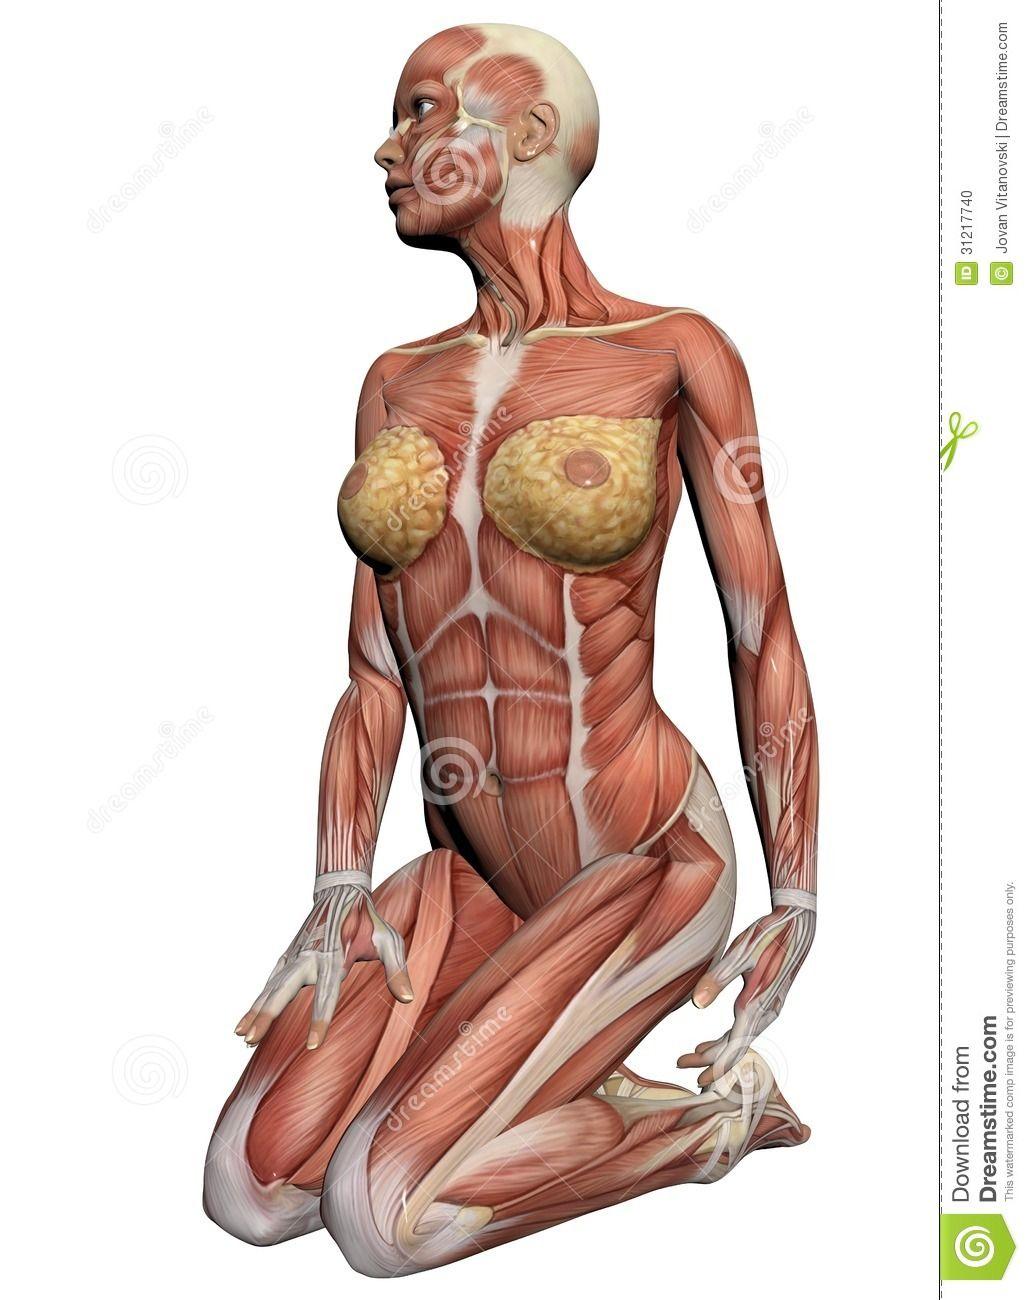 Anatomia umana - muscoli femminili fatti nel software 3d. | Anatomy ...